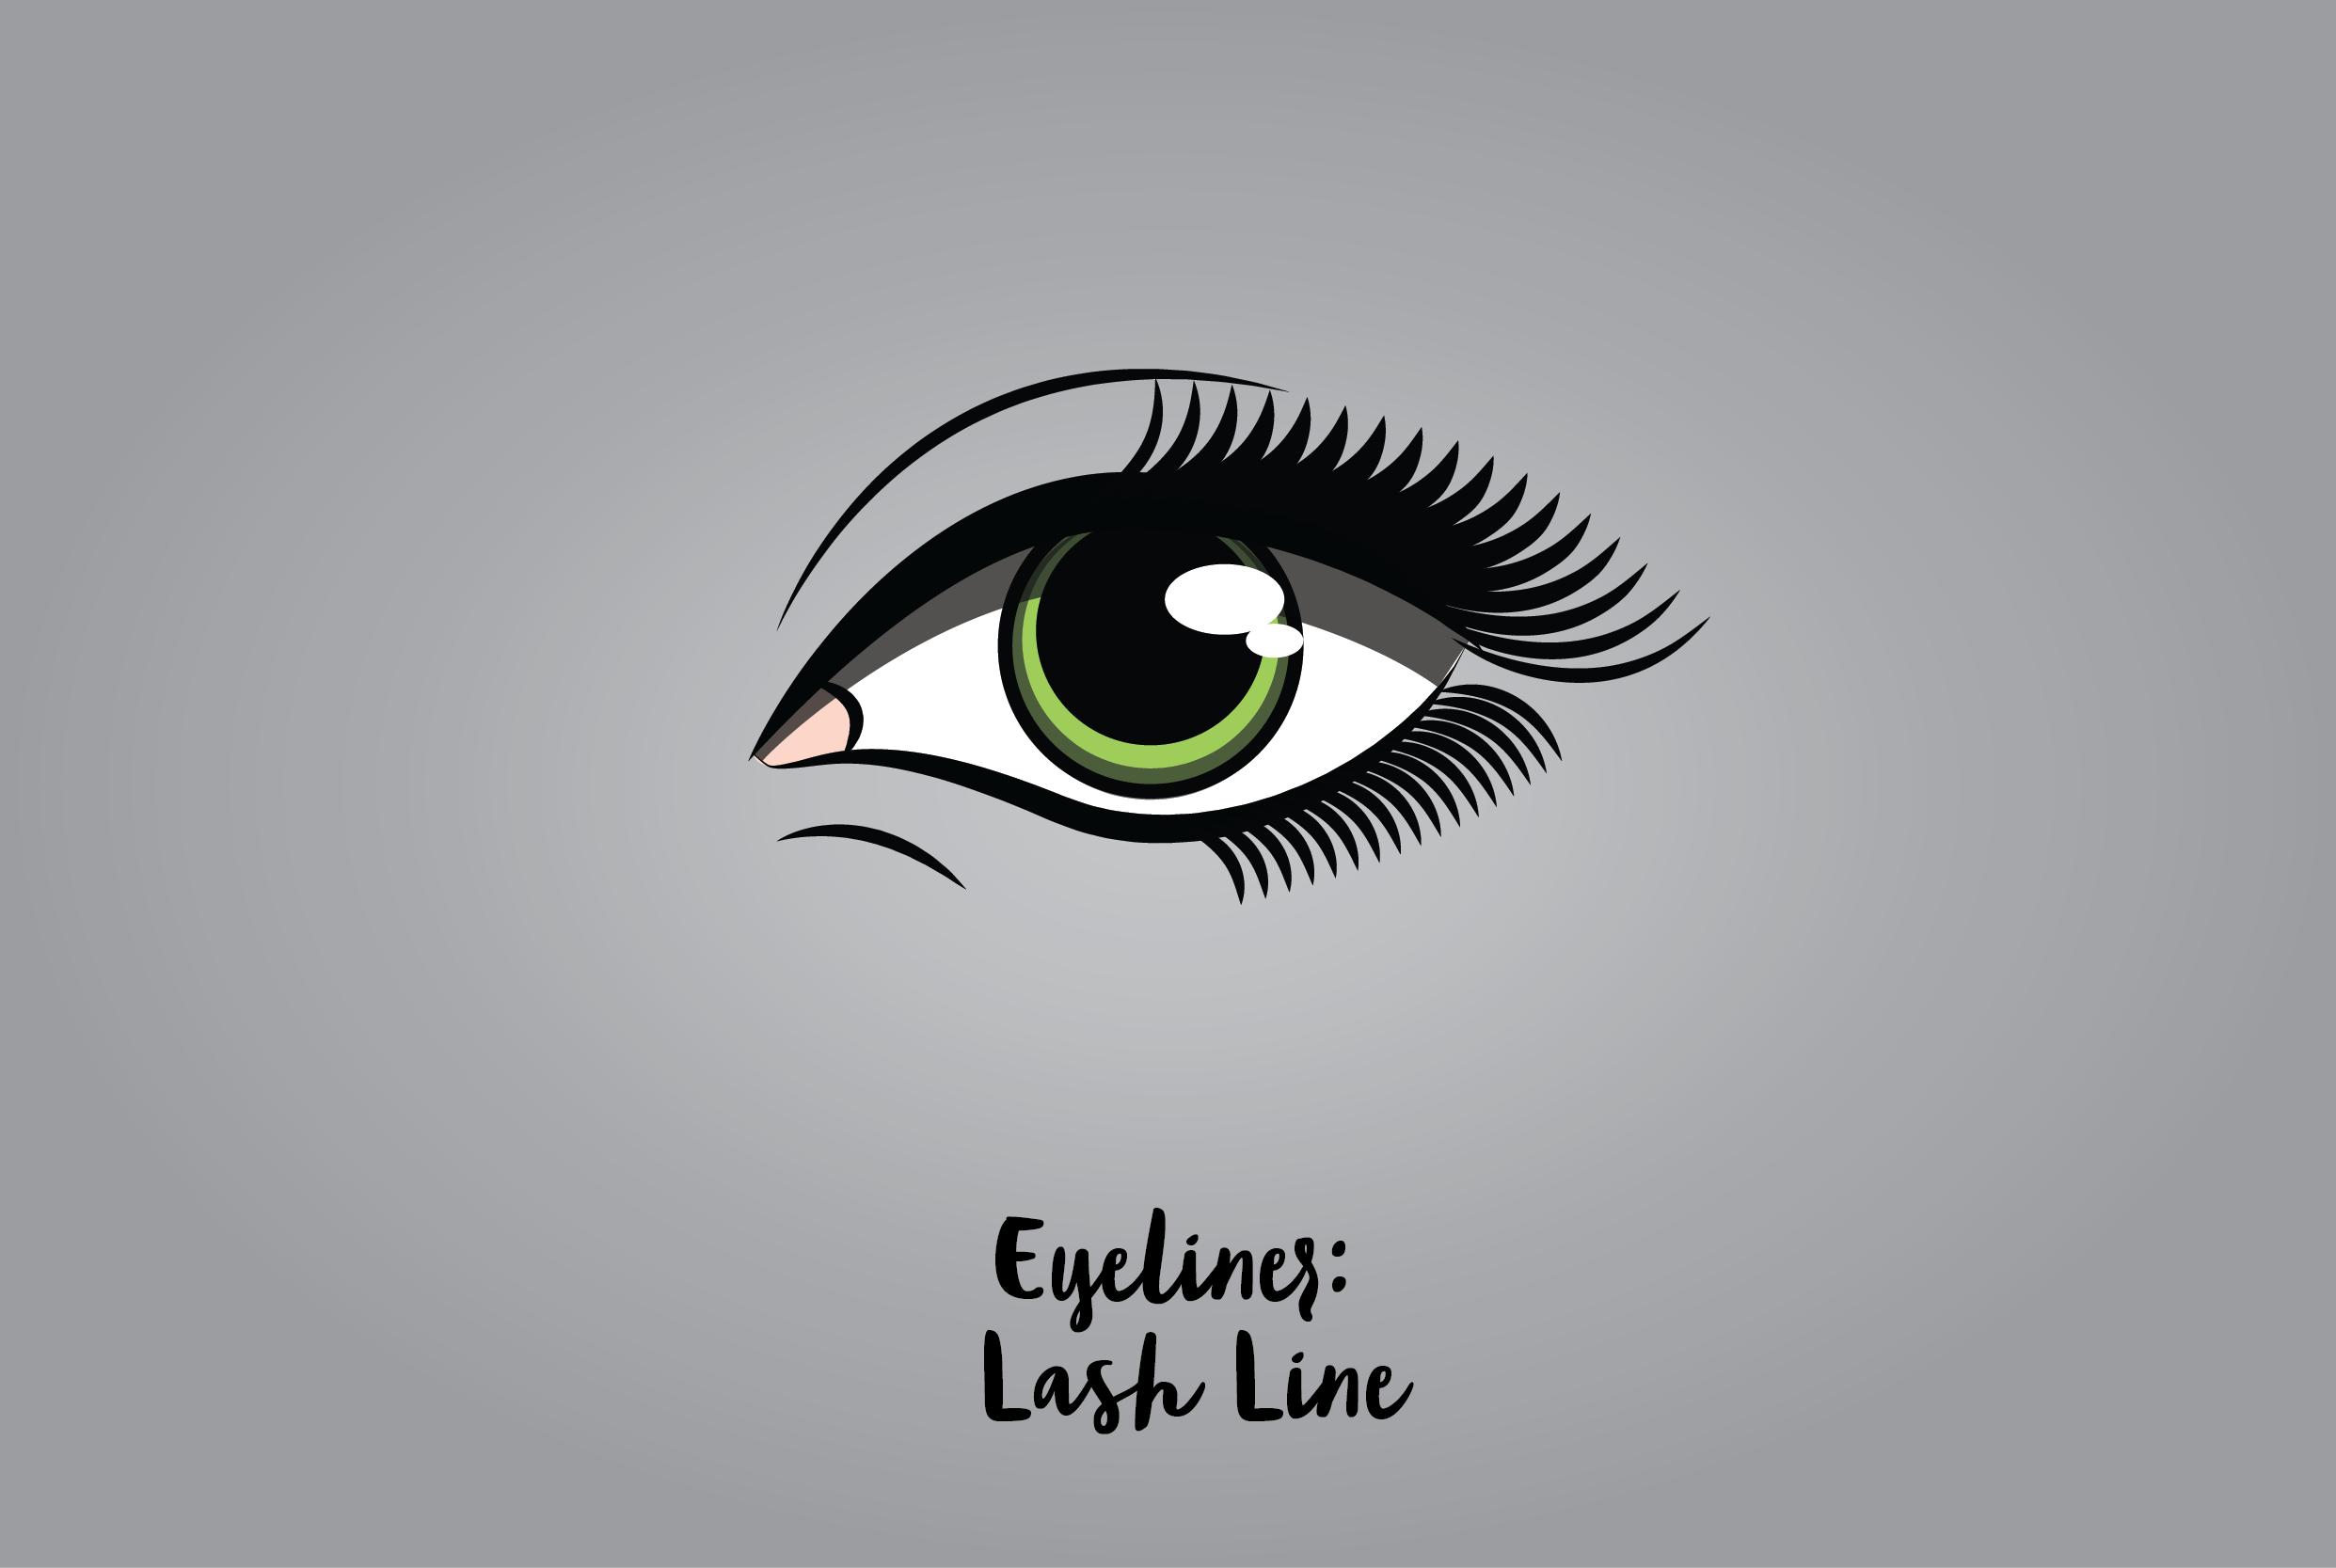 Eyeliner: Lash Line